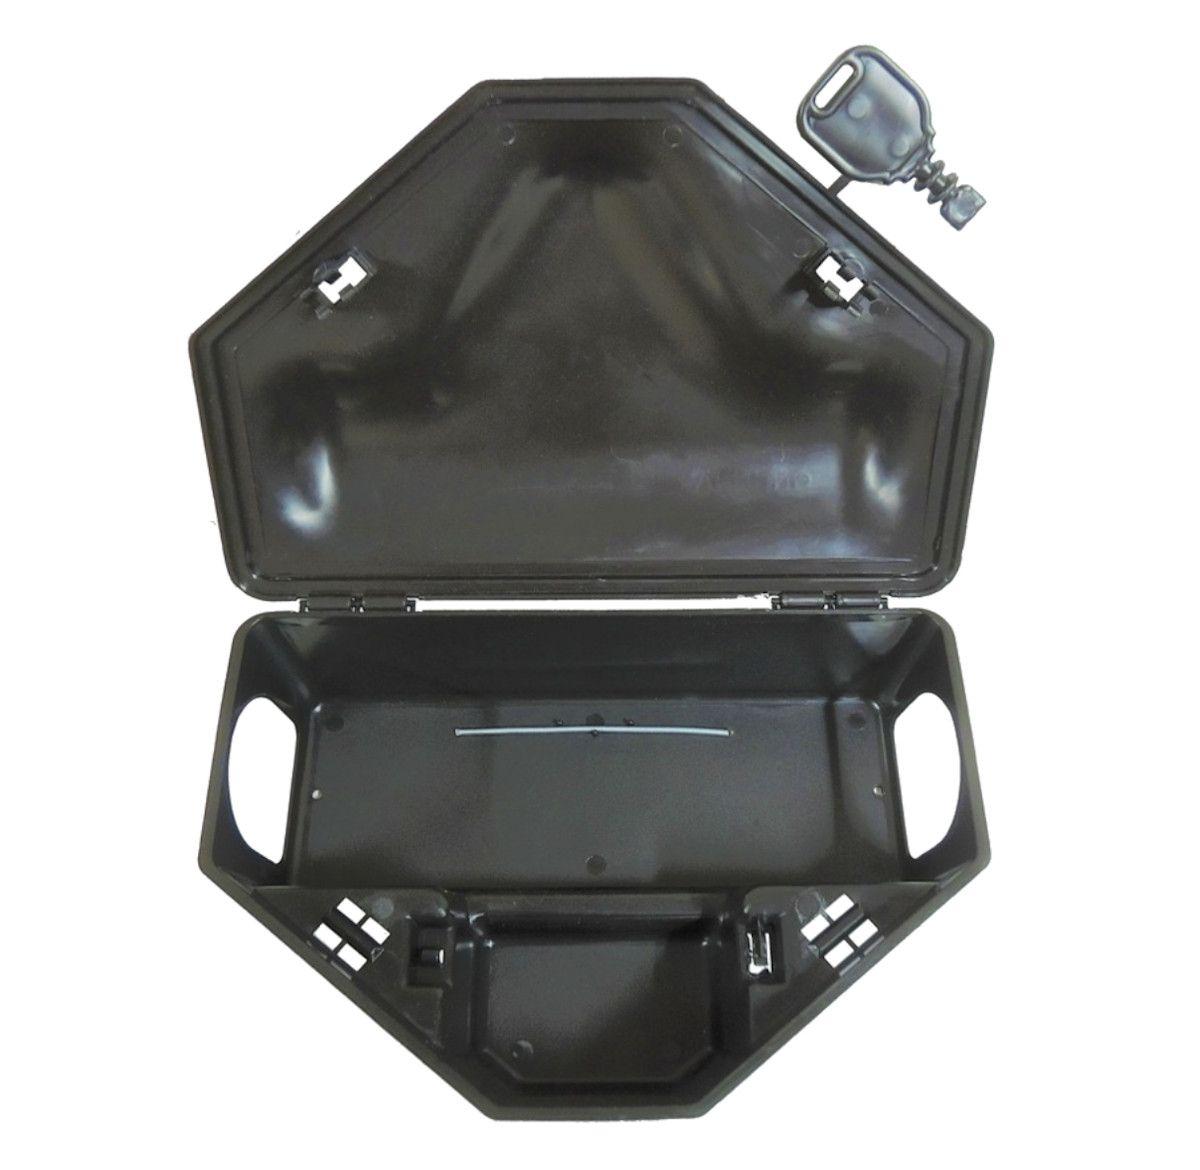 Kit 58 Porta Isca C/2 Chaves + 58 Bloco Extrusado Mata Seca